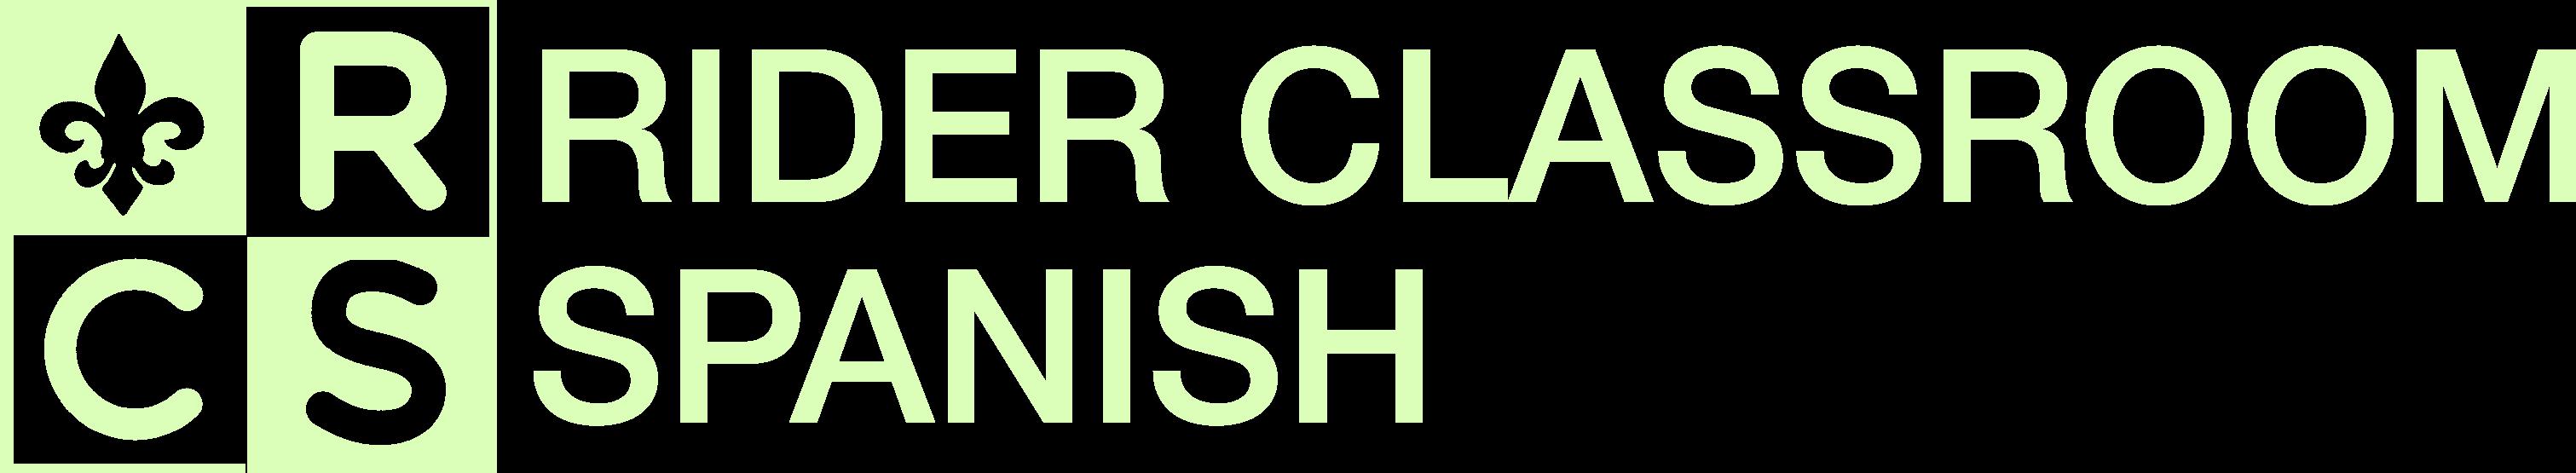 Rider Classroom Spanish